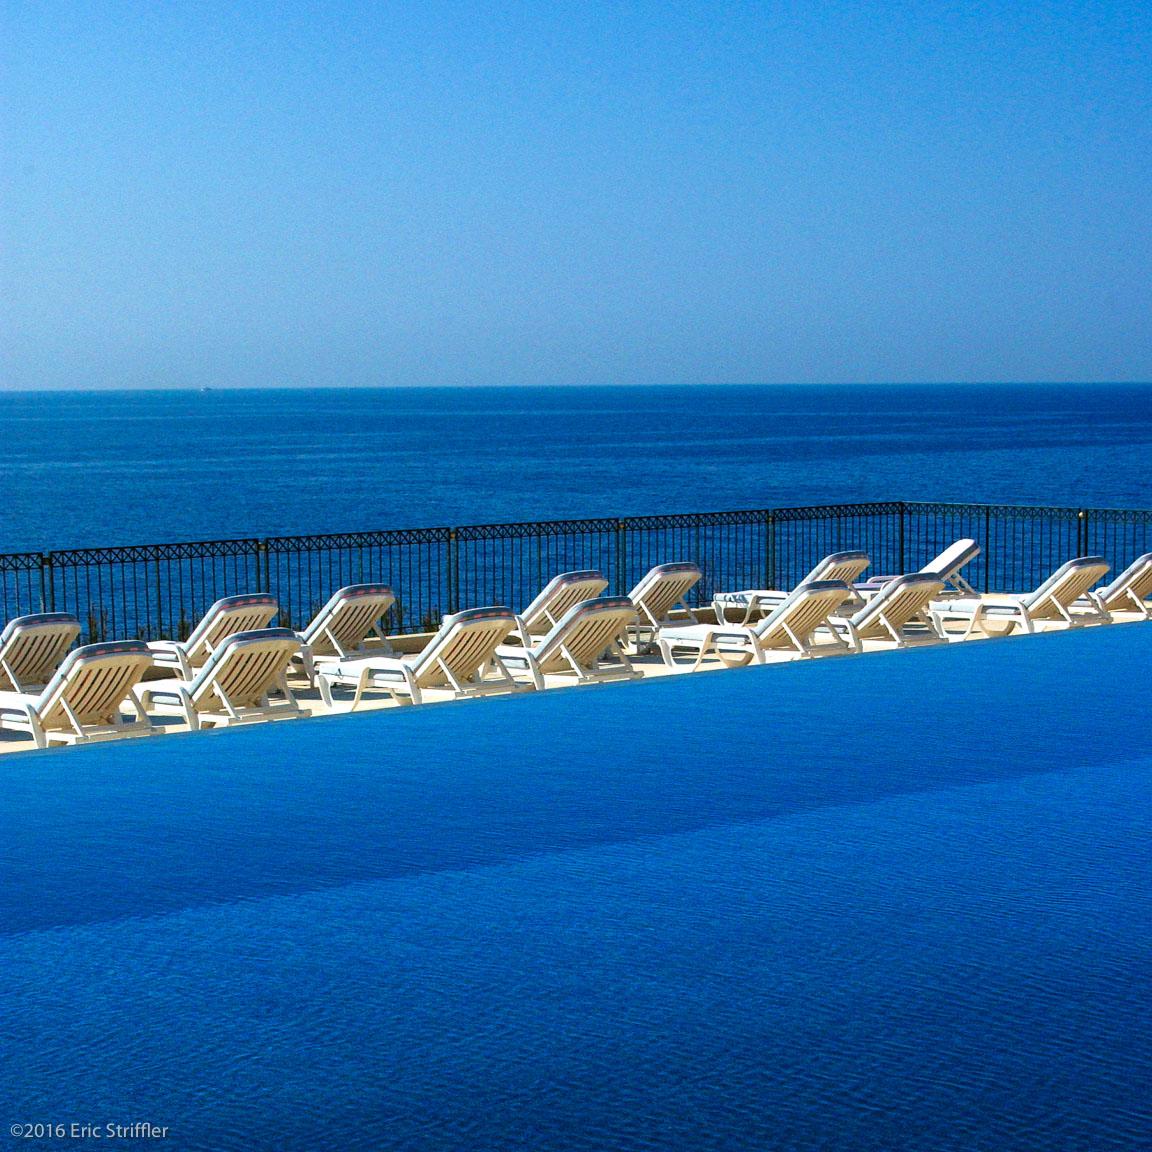 Grand Hotel Du Cap Ferrat, Nice, France